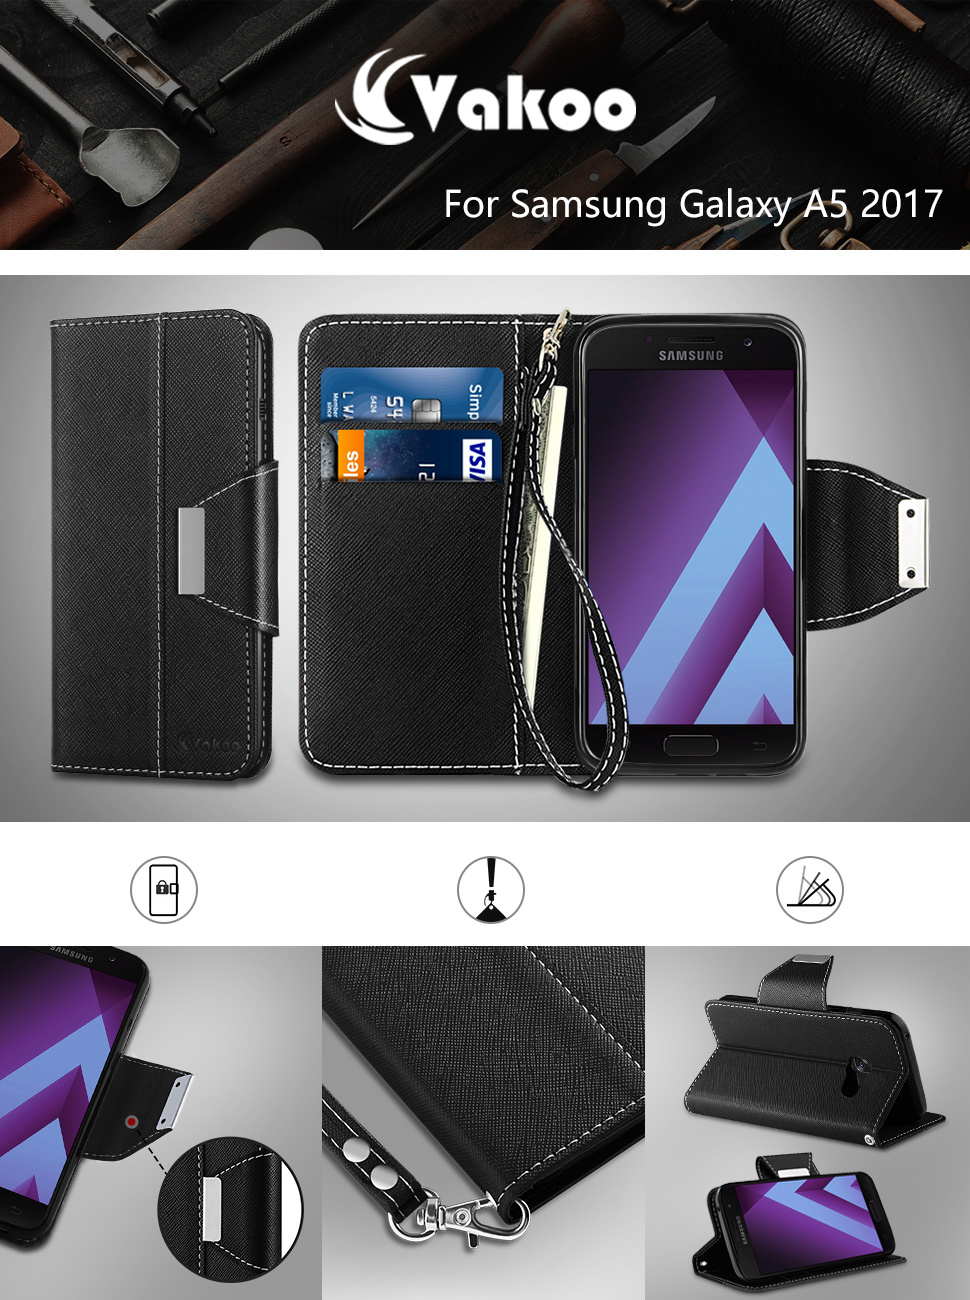 vakoo coque samsung a5 2017 housse samsung galaxy a5 2017 etui case cover pour samsung galaxy. Black Bedroom Furniture Sets. Home Design Ideas